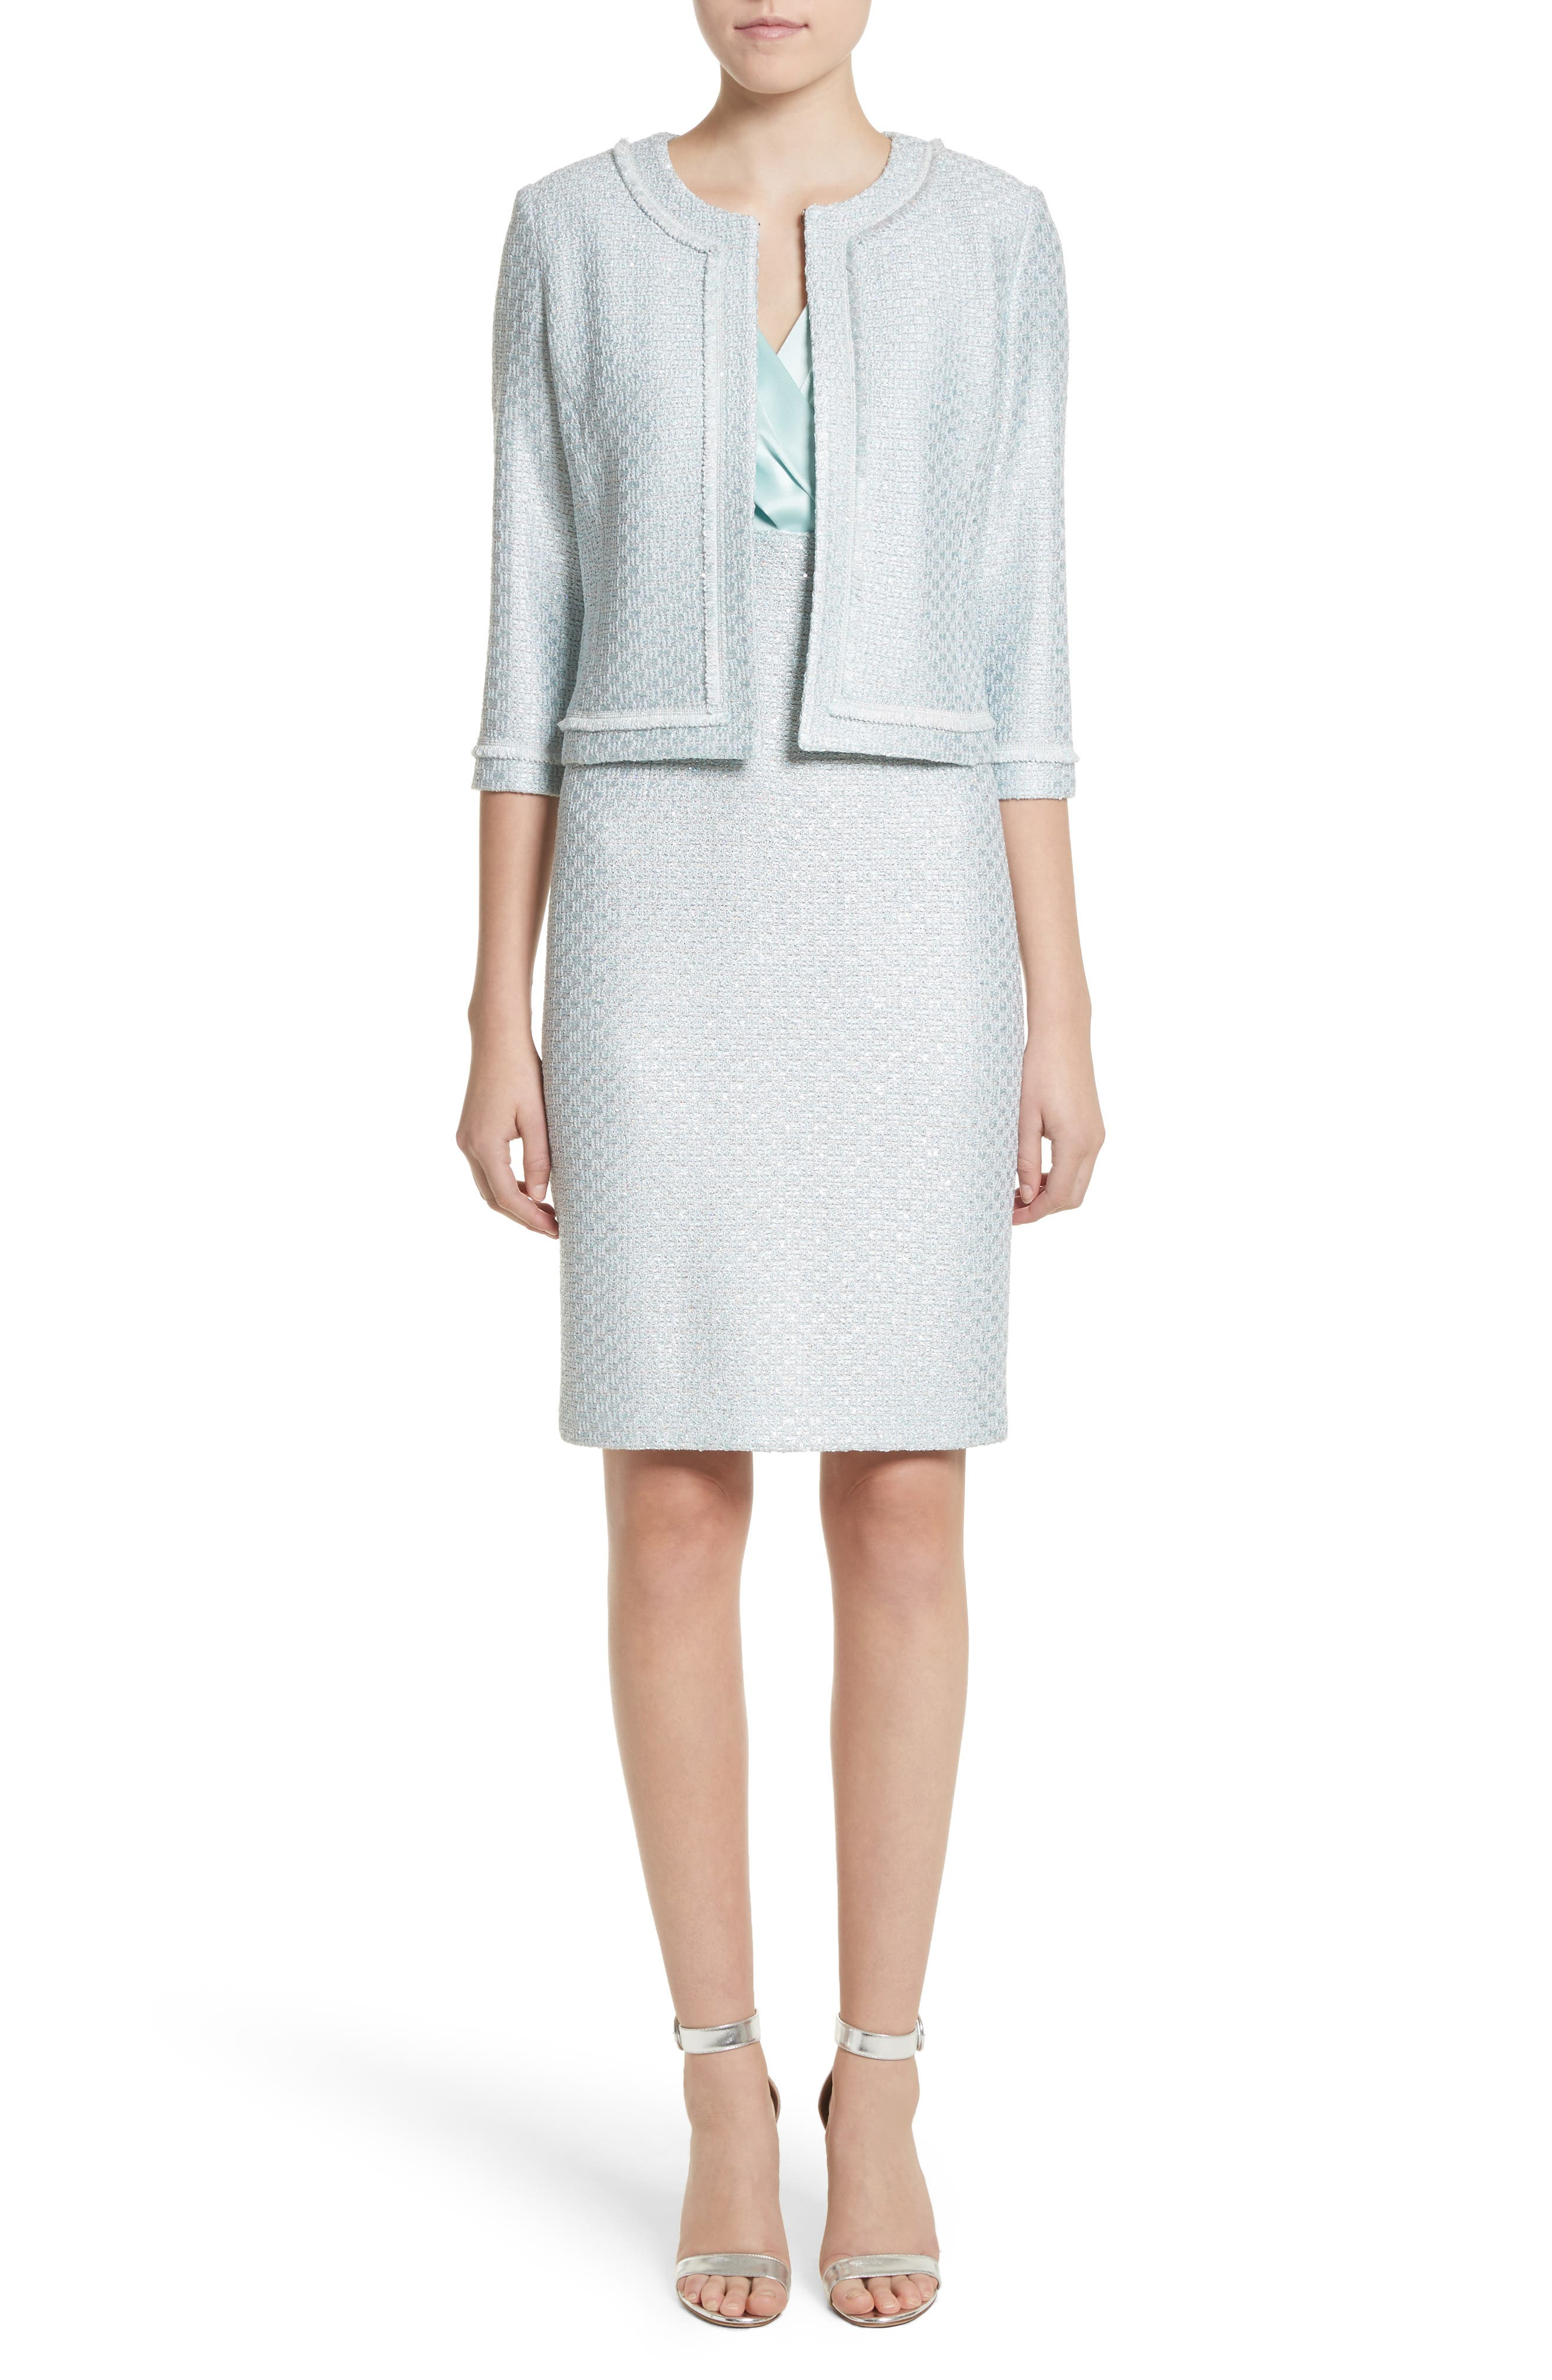 Hansh Satin & Knit Sheath Dress,                             Alternate thumbnail 7, color,                             440